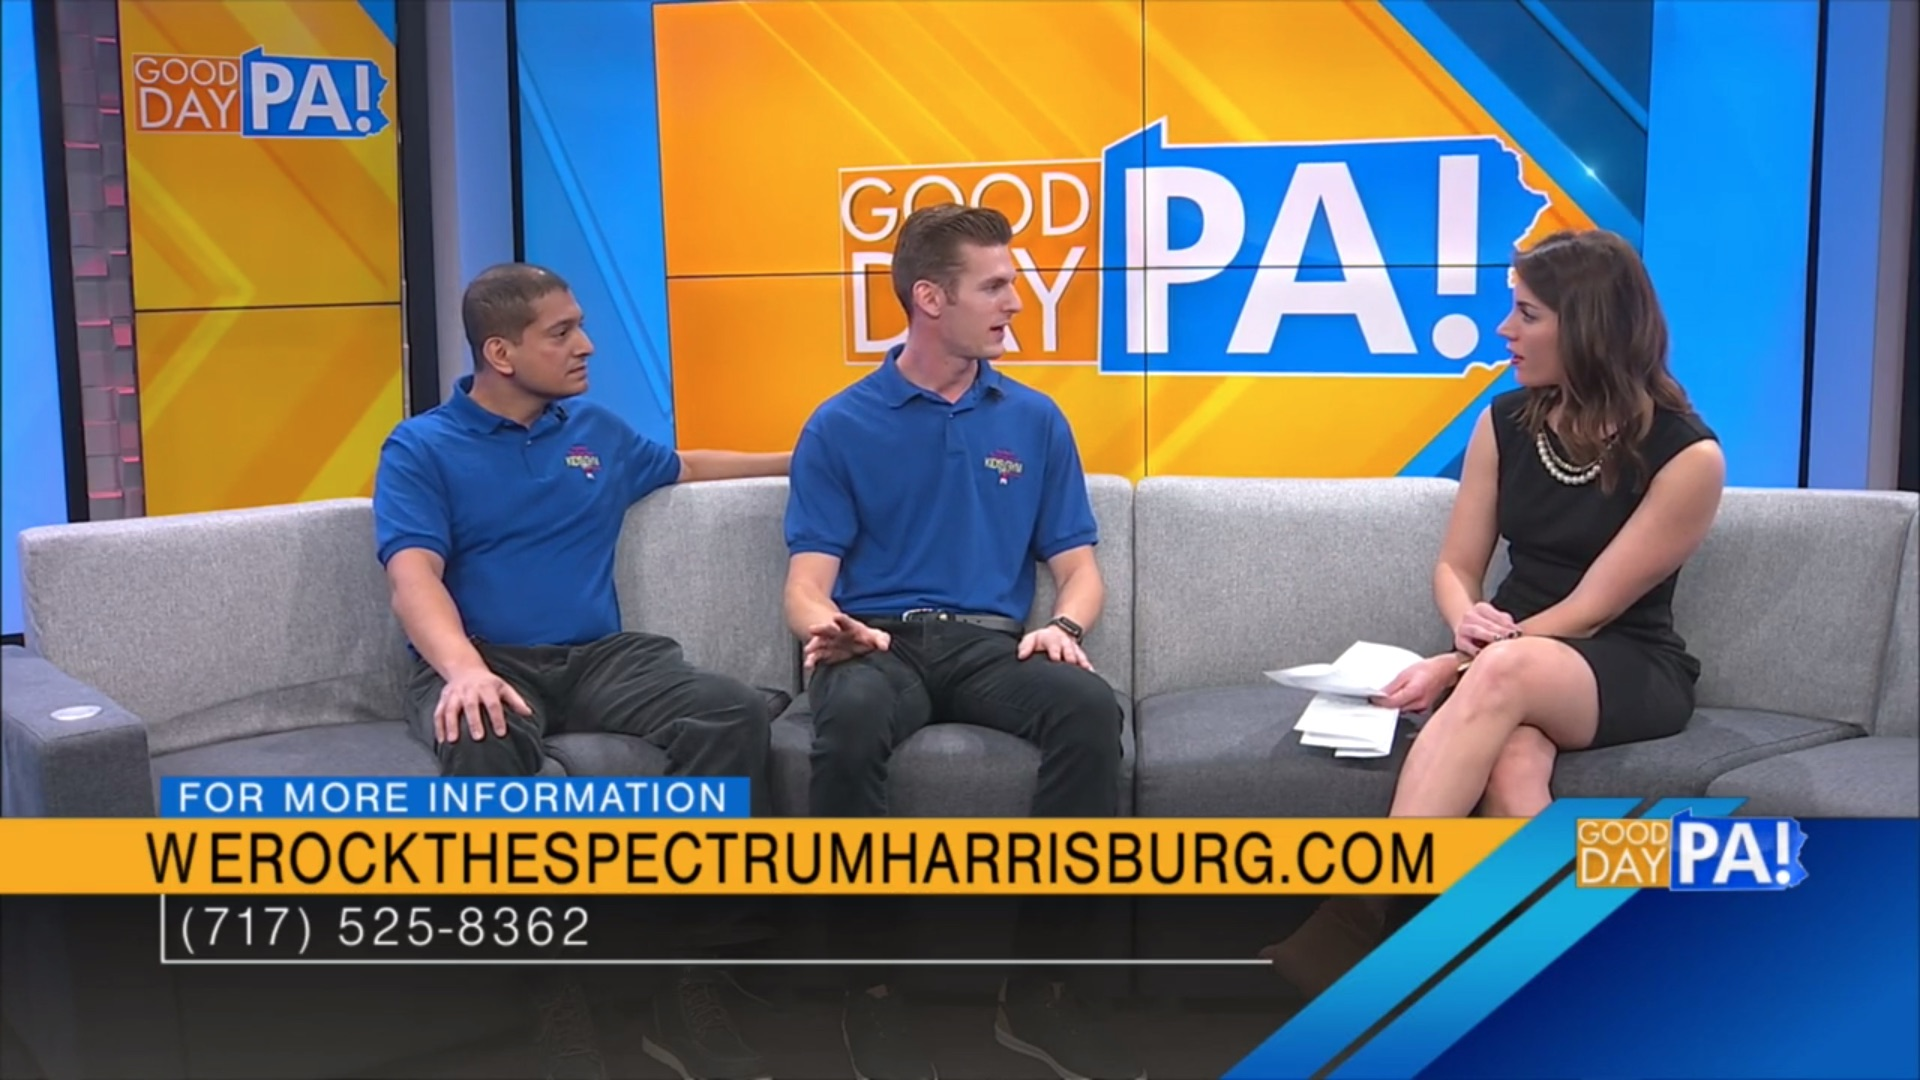 WRTS Harrisburg Good Day PA